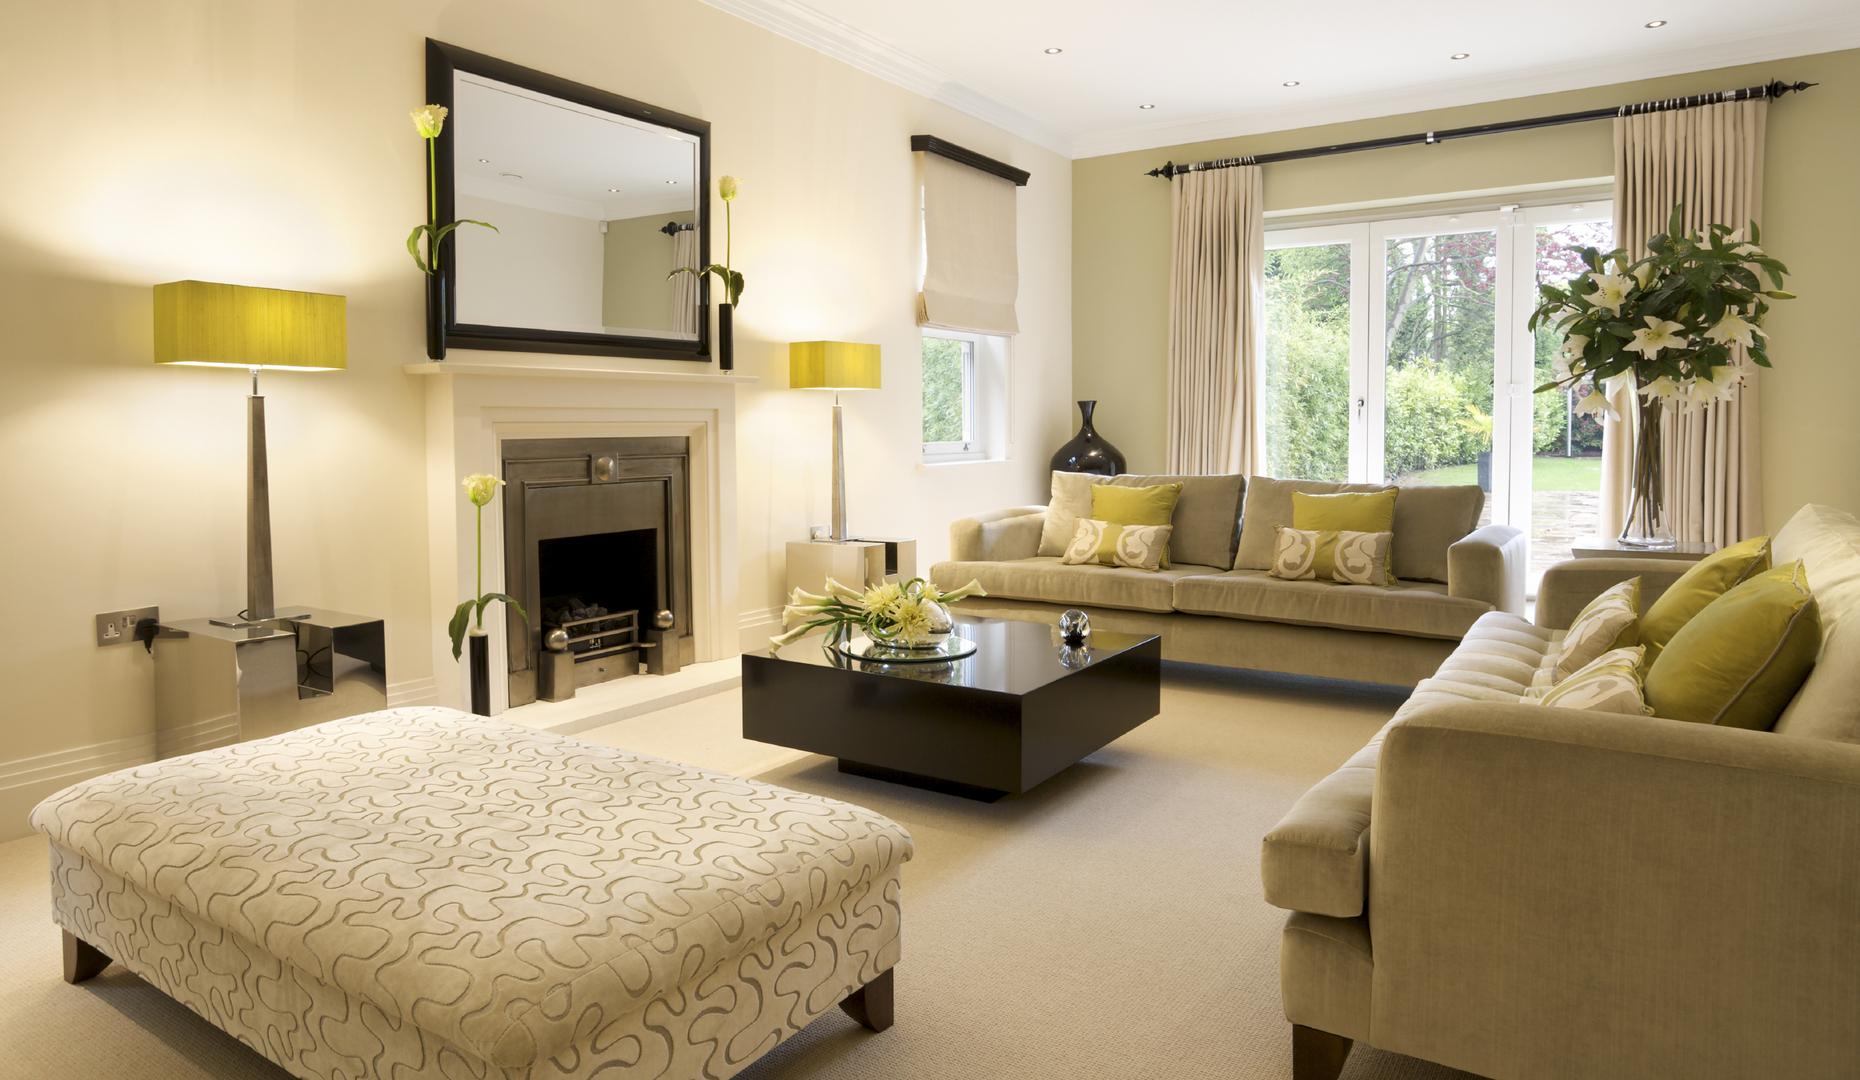 Interior Design Home Staging. Read More Jody Wilens  Interior Design Transformations Home Staging